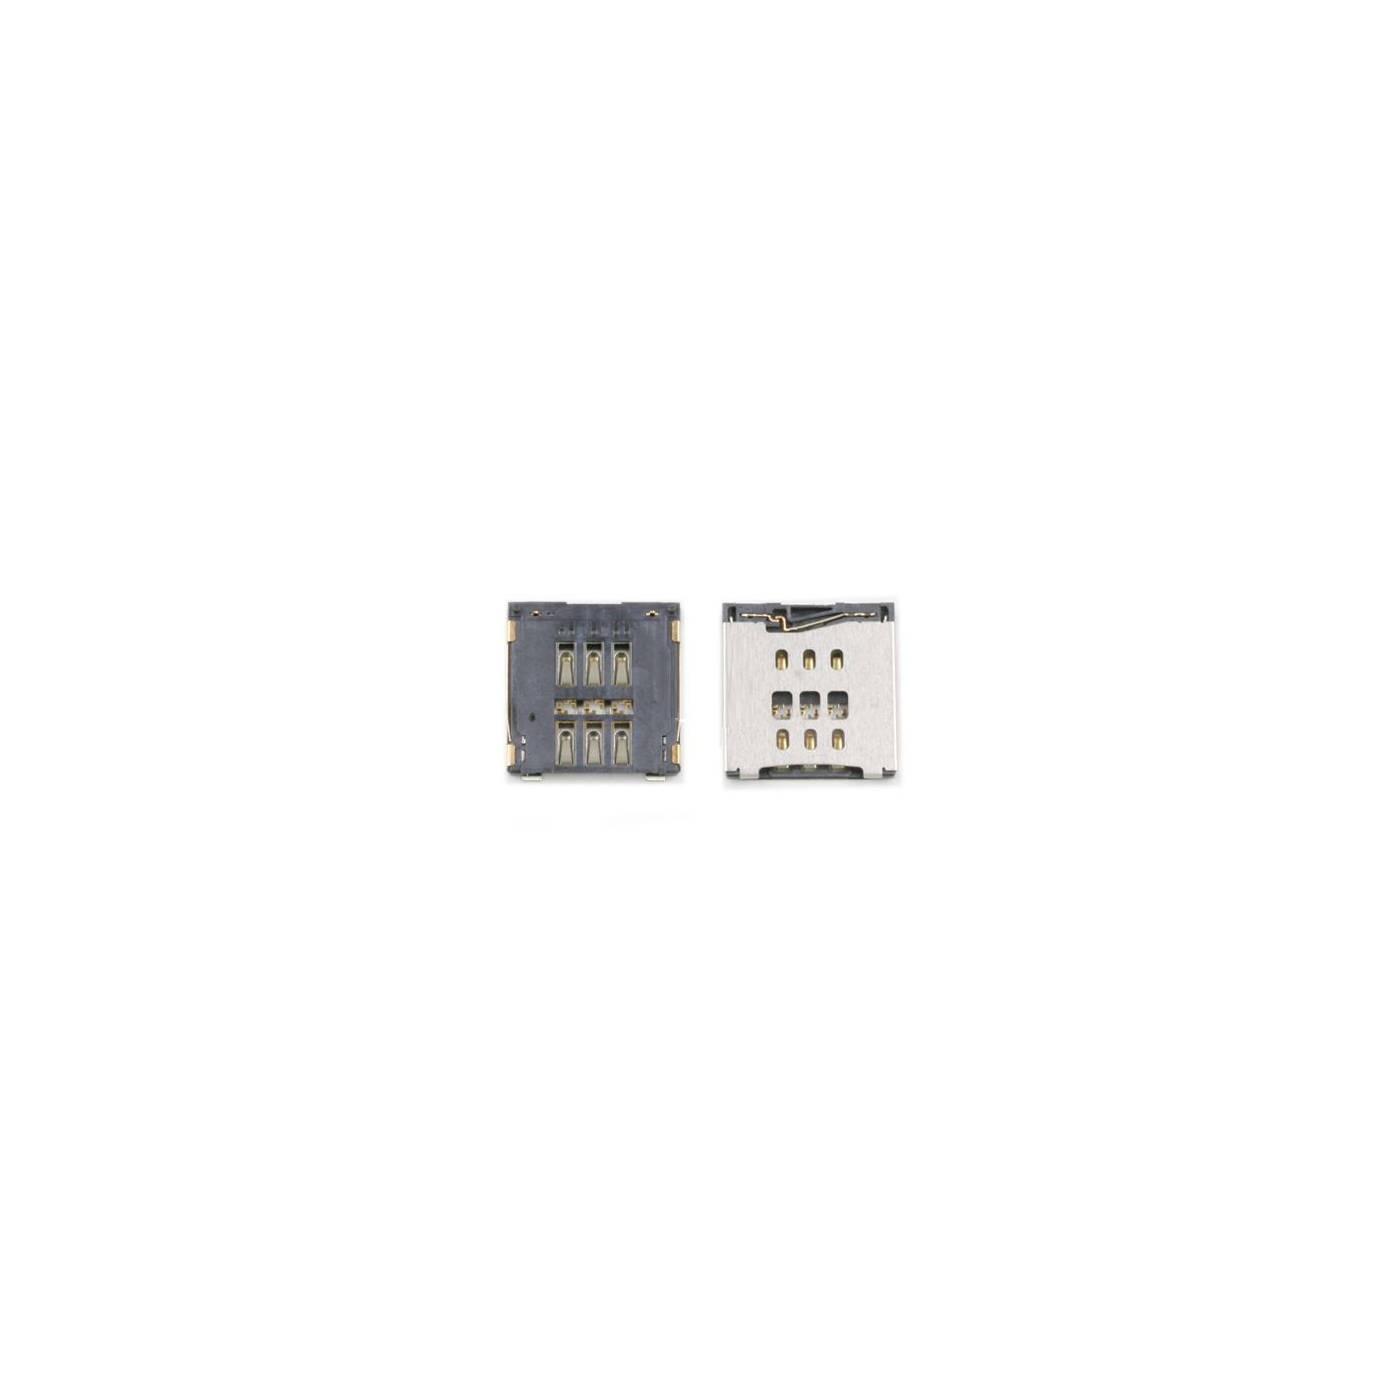 Conector de tarjeta SIM para Iphone 6 nano lector Lector de tarjeta SIM Contacto